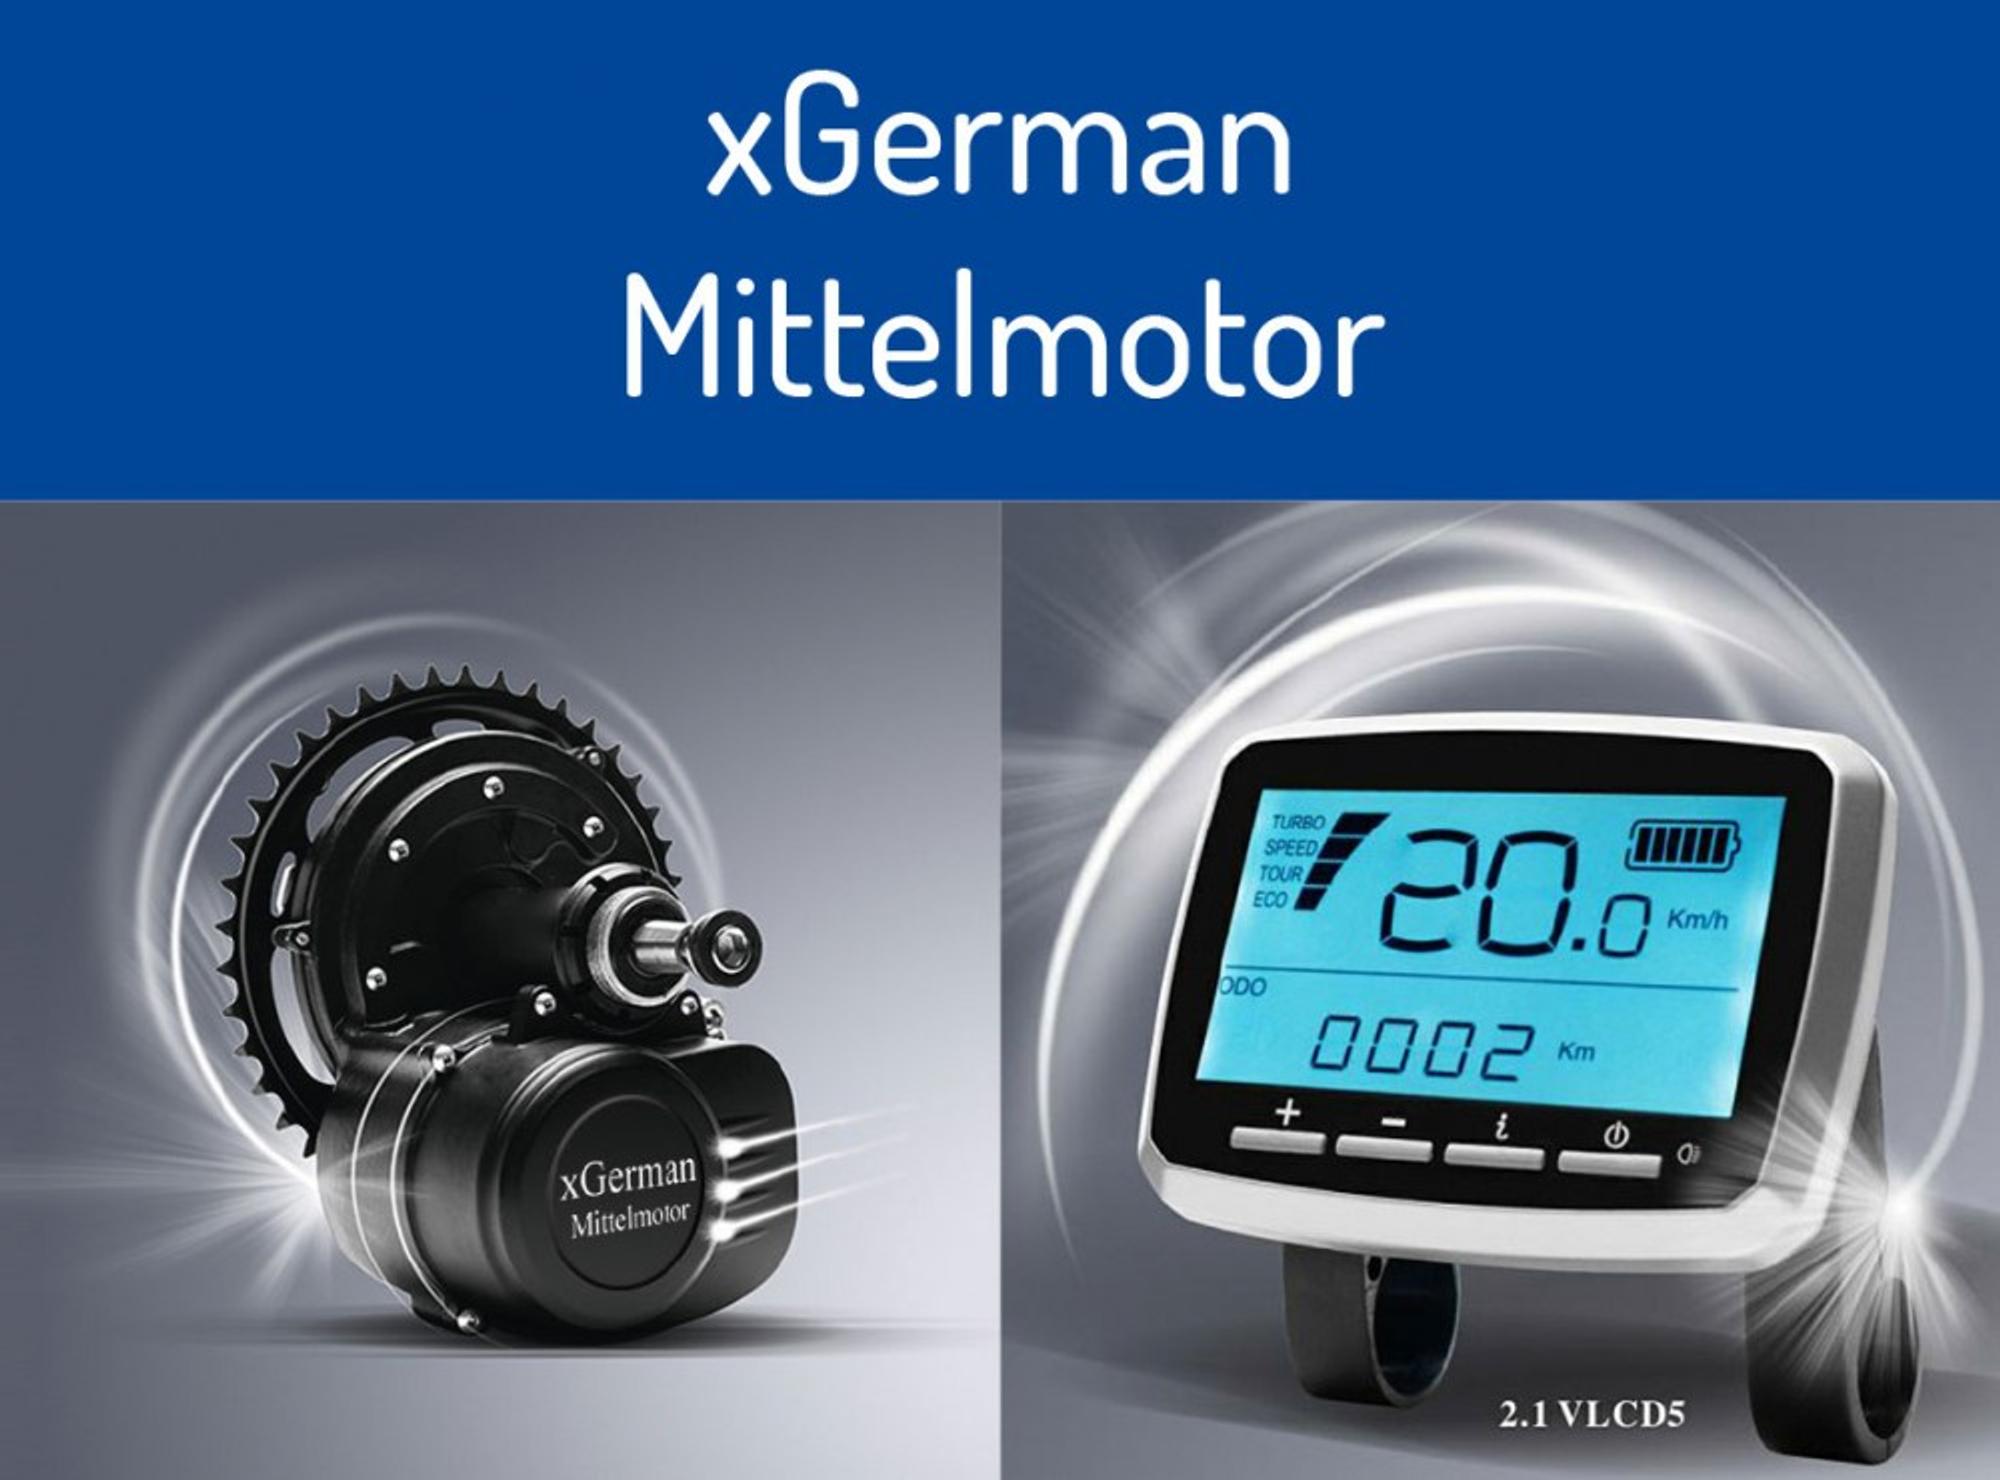 KONFIGURATOR xGerman Umbausatz Mittelmotor-Antrieb 250W/36V/80Nm